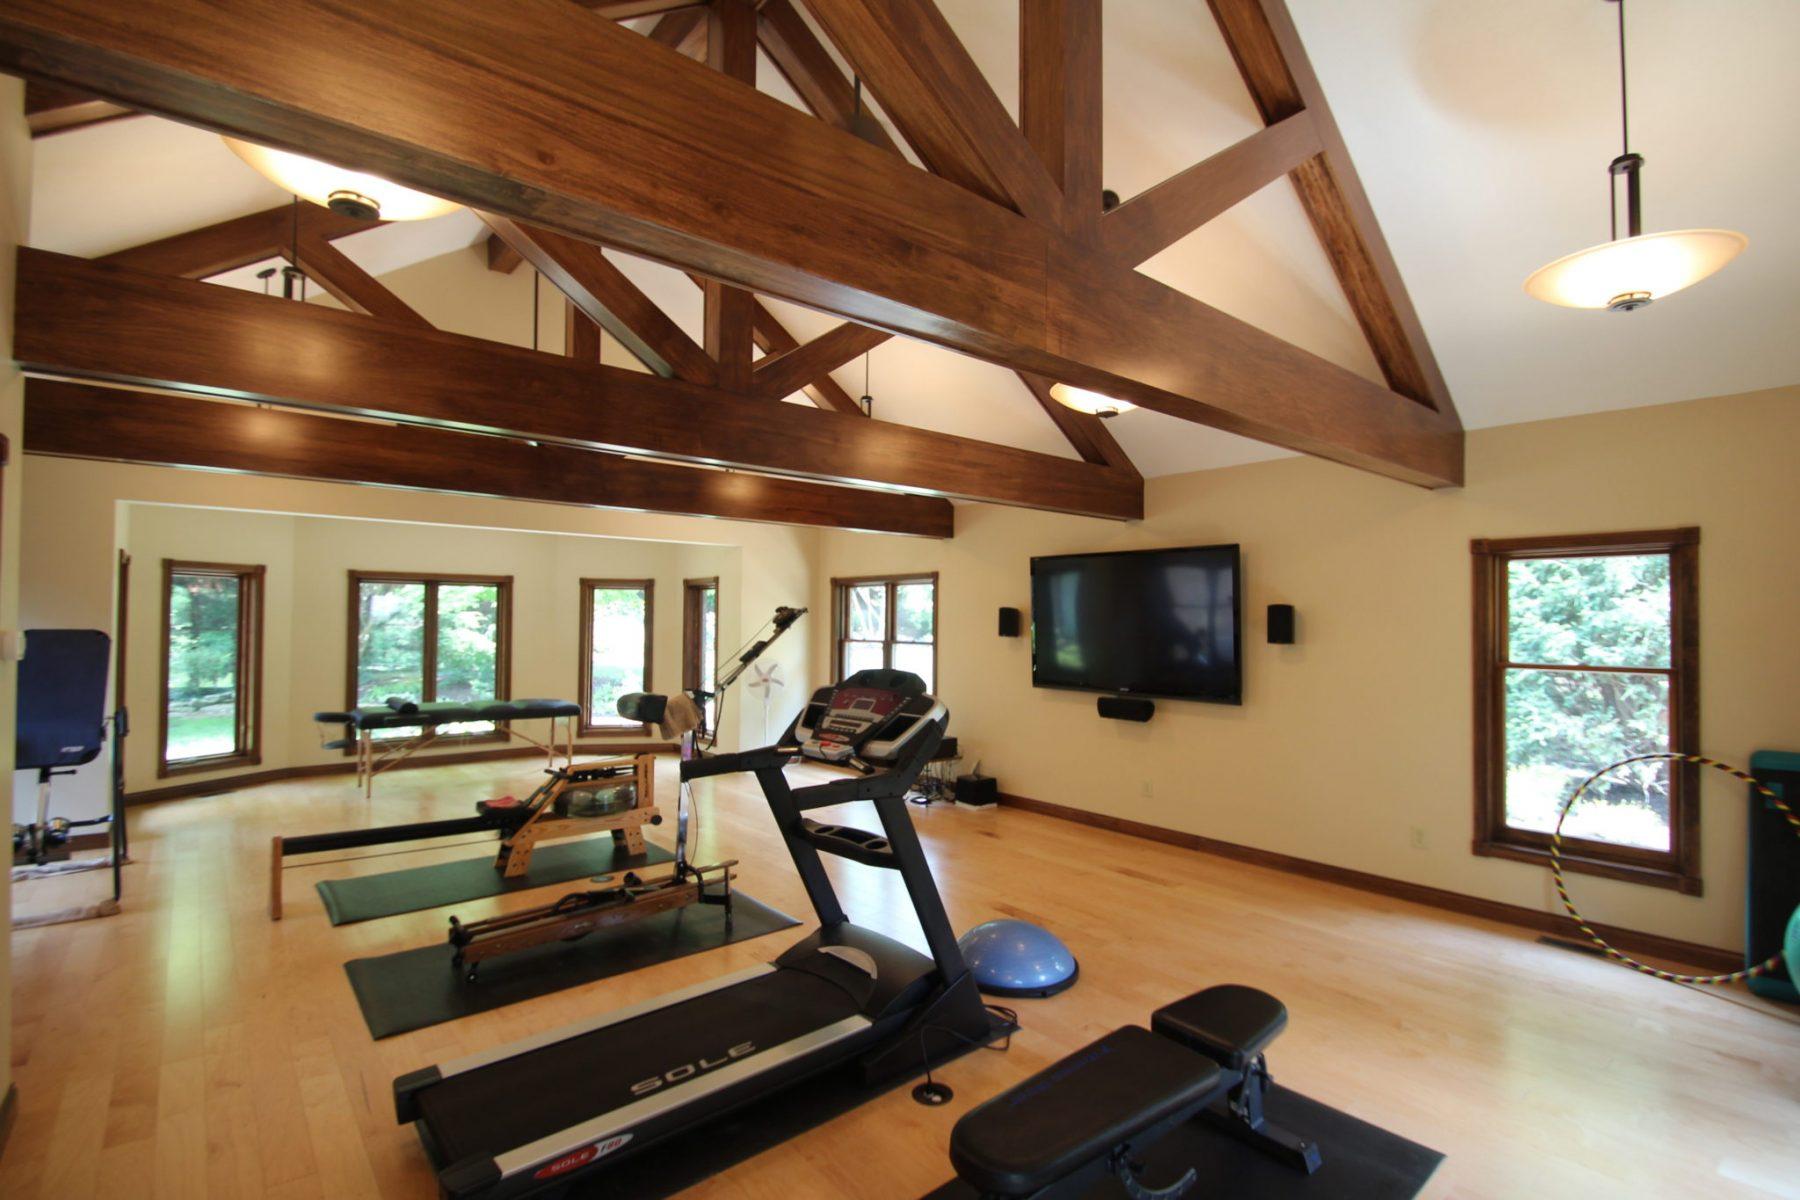 vaulted ceiling beams